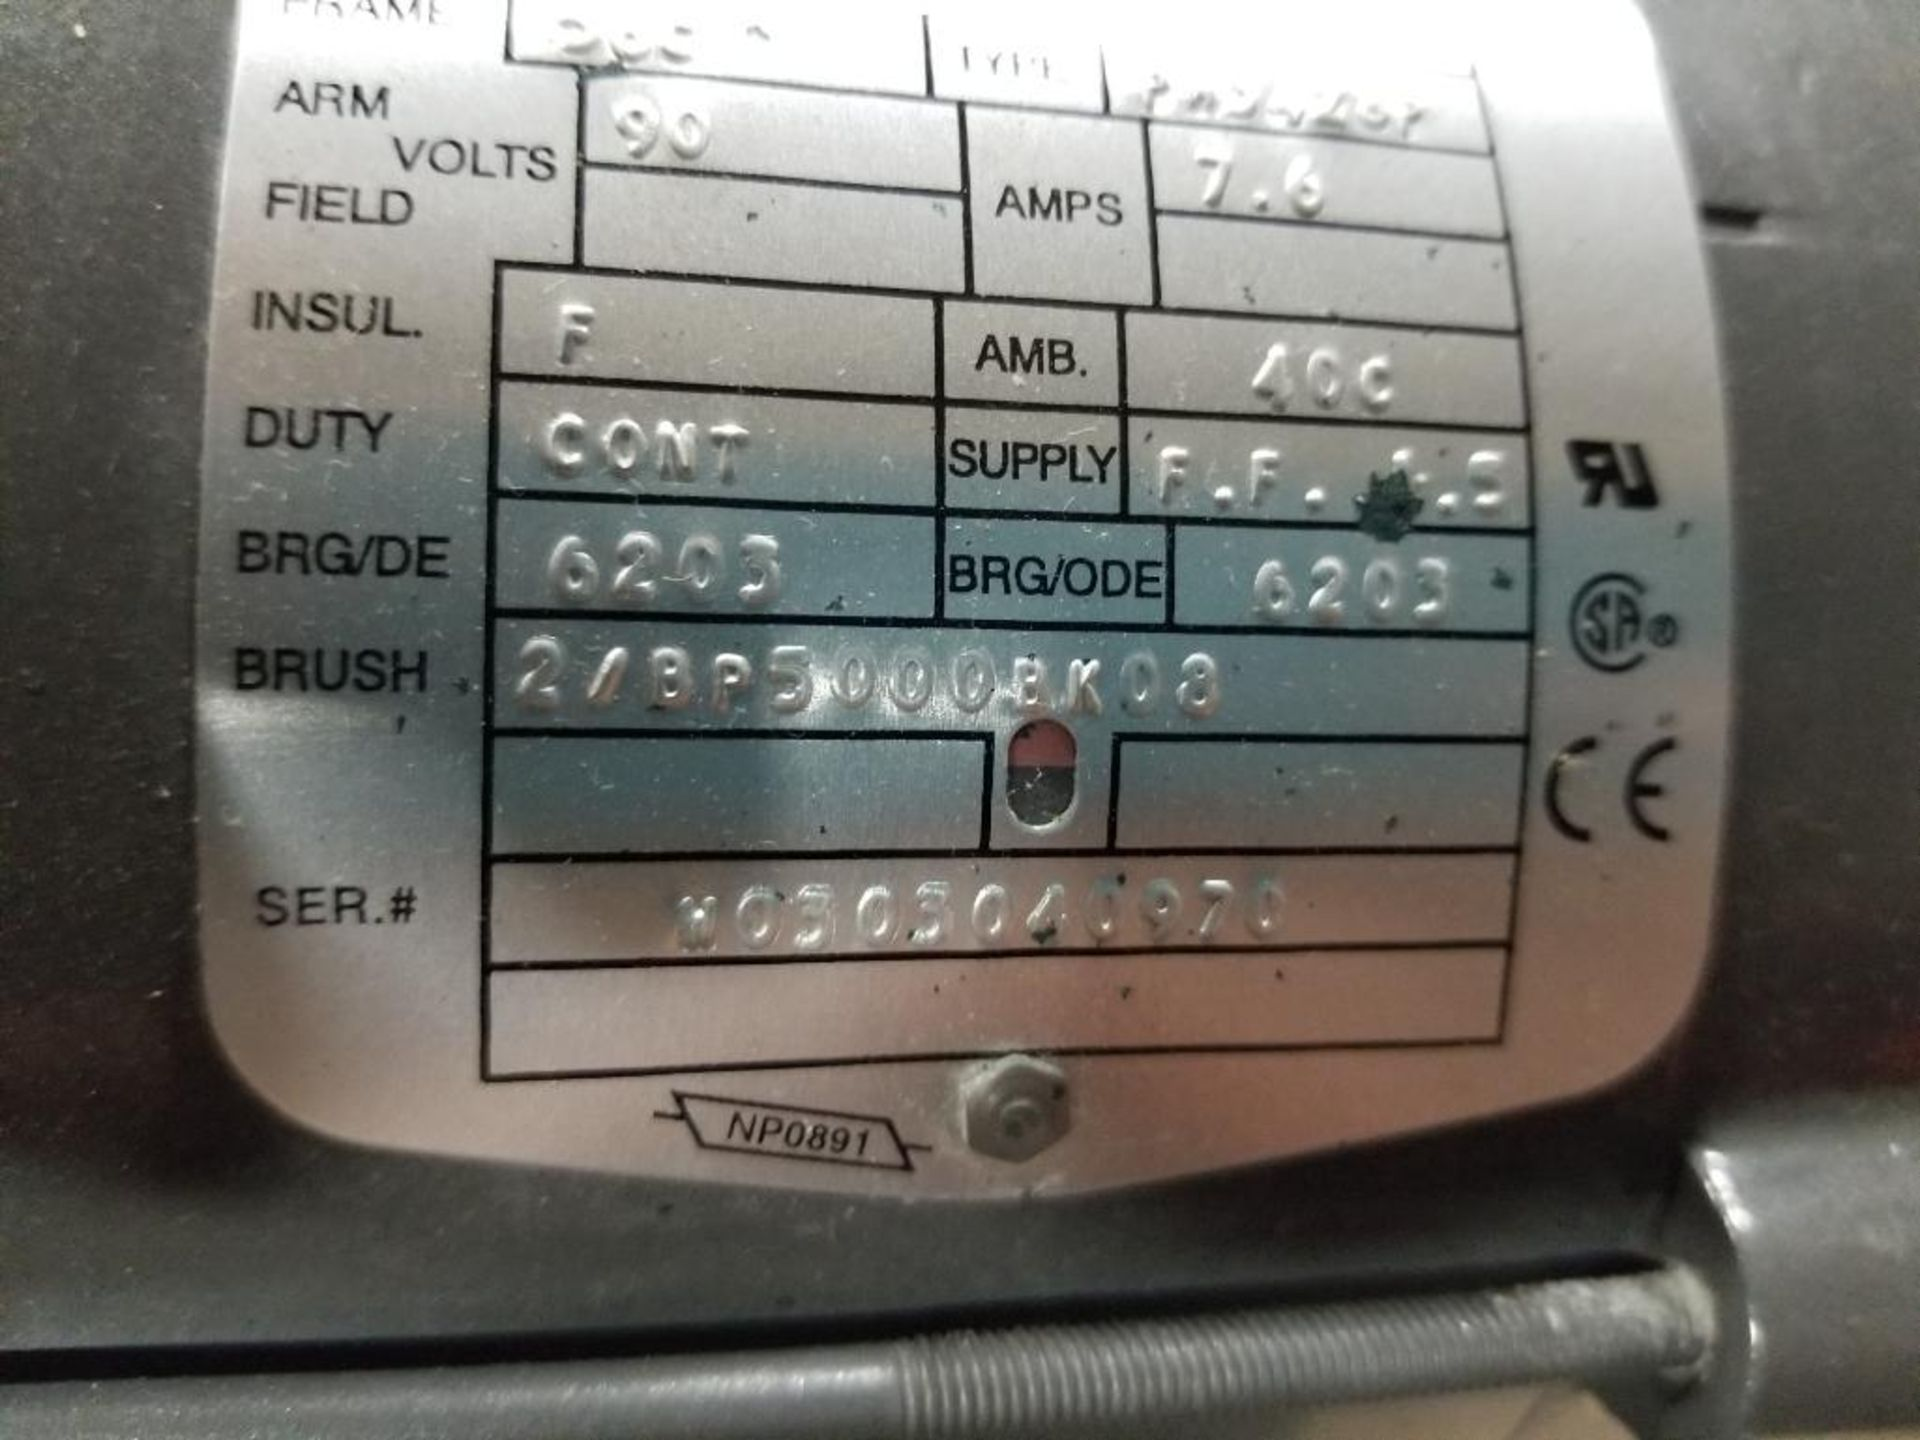 3/4HP Baldor industrial motor COP3440, 34-5990-3662. 1750RPM, 56C-Frame. - Image 4 of 5